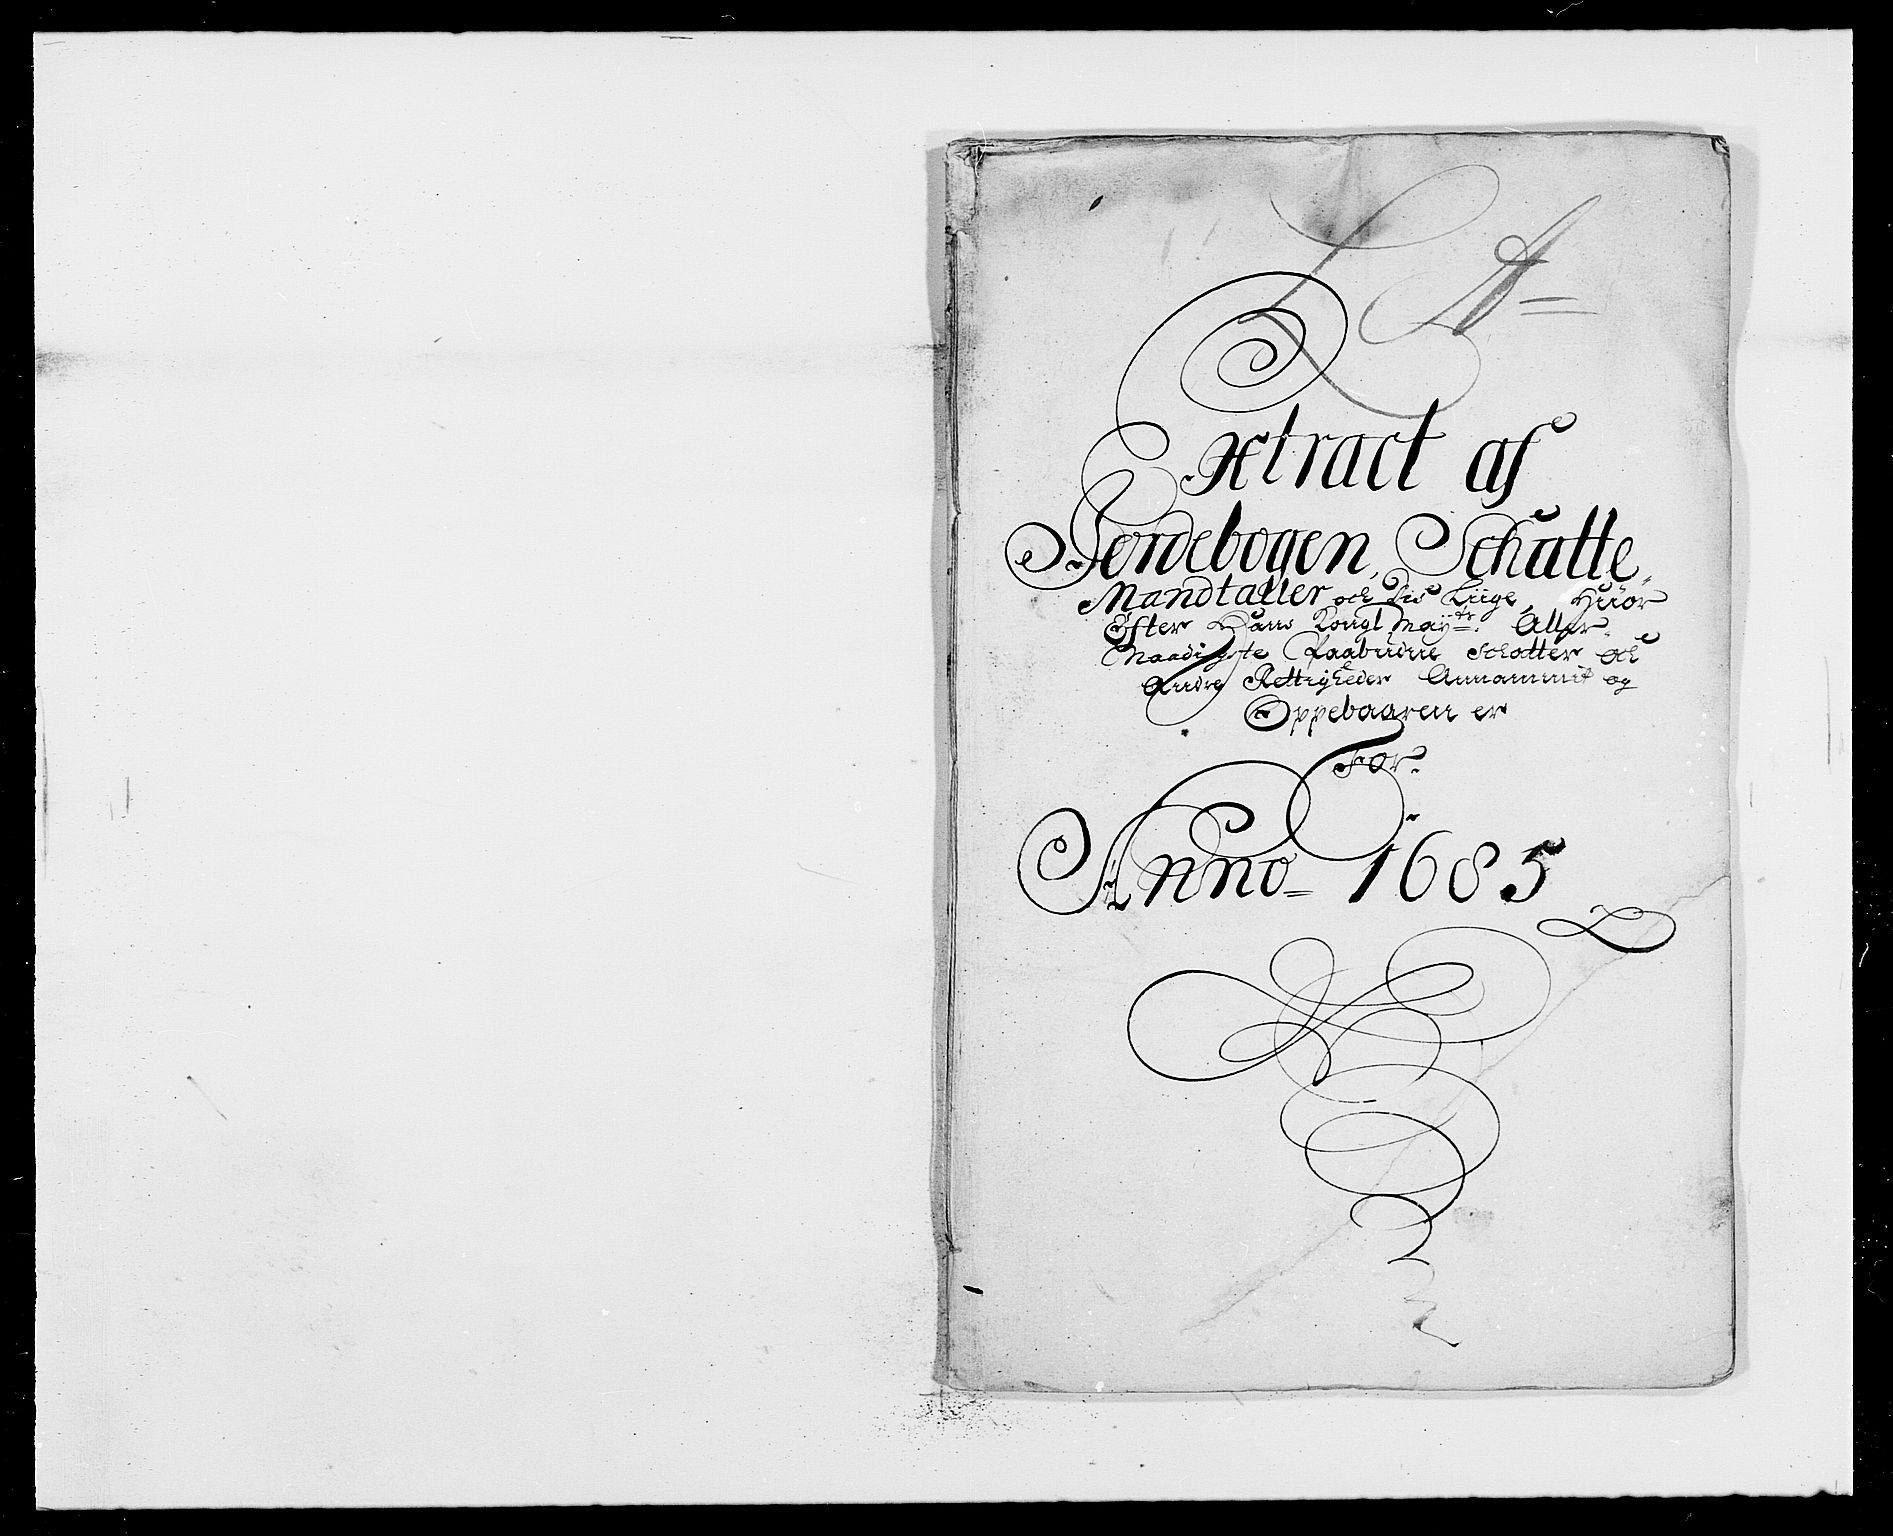 RA, Rentekammeret inntil 1814, Reviderte regnskaper, Fogderegnskap, R41/L2533: Fogderegnskap Lista, 1684-1685, s. 162